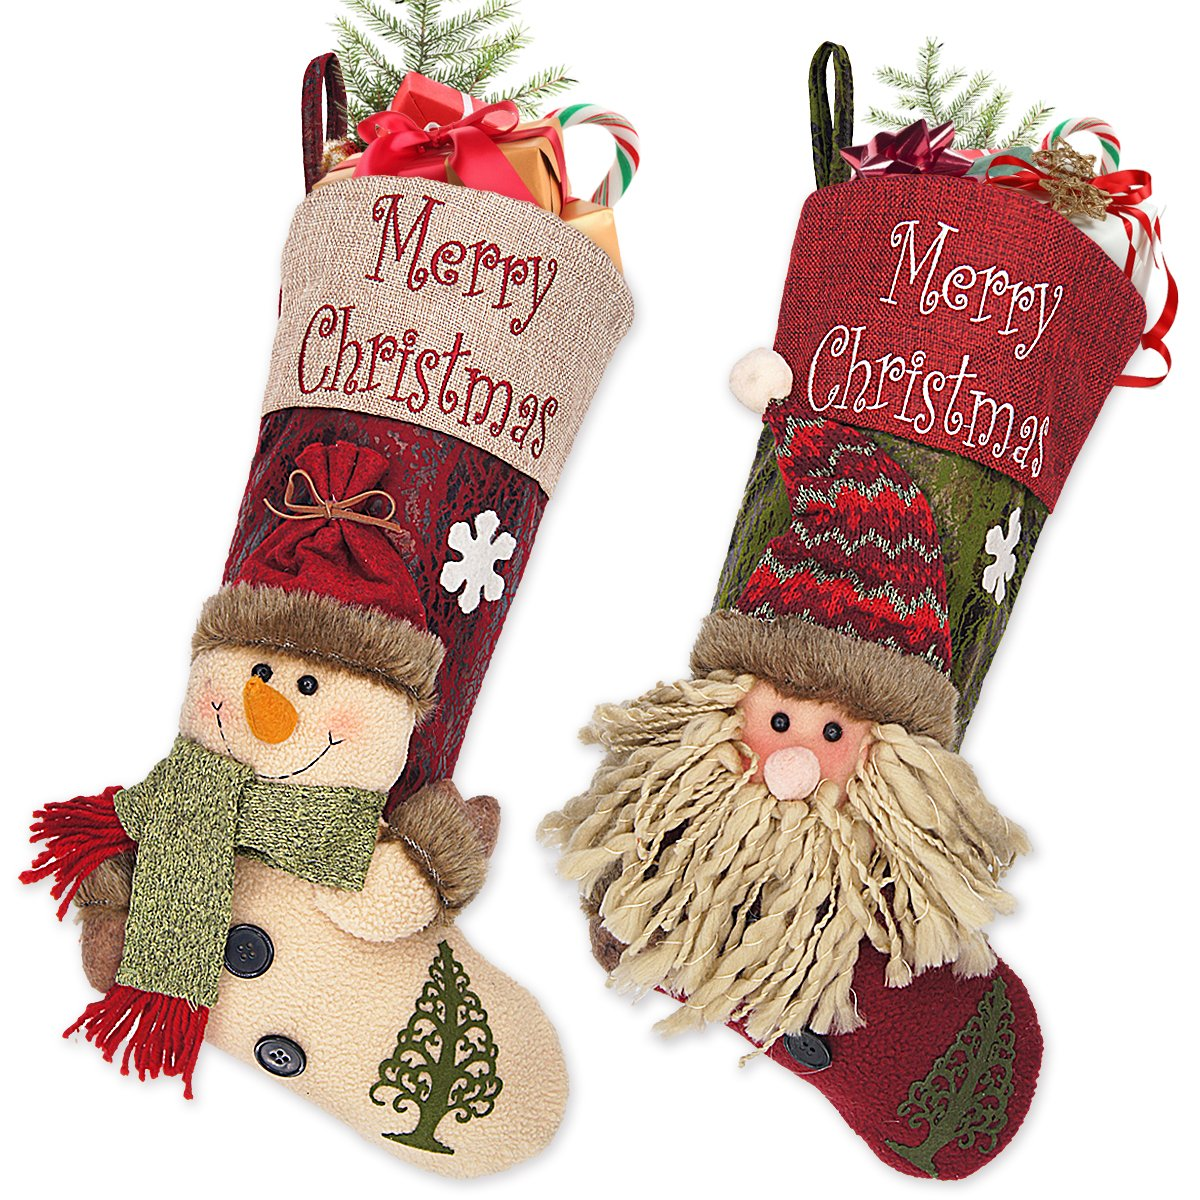 (3d Snow Man/Santa) - Ivenf 2 Pack 46cm Plush 3D Classic Large Christmas Stockings Christmas Party Decoration  3d Snow Man/Santa B017IGSOCO